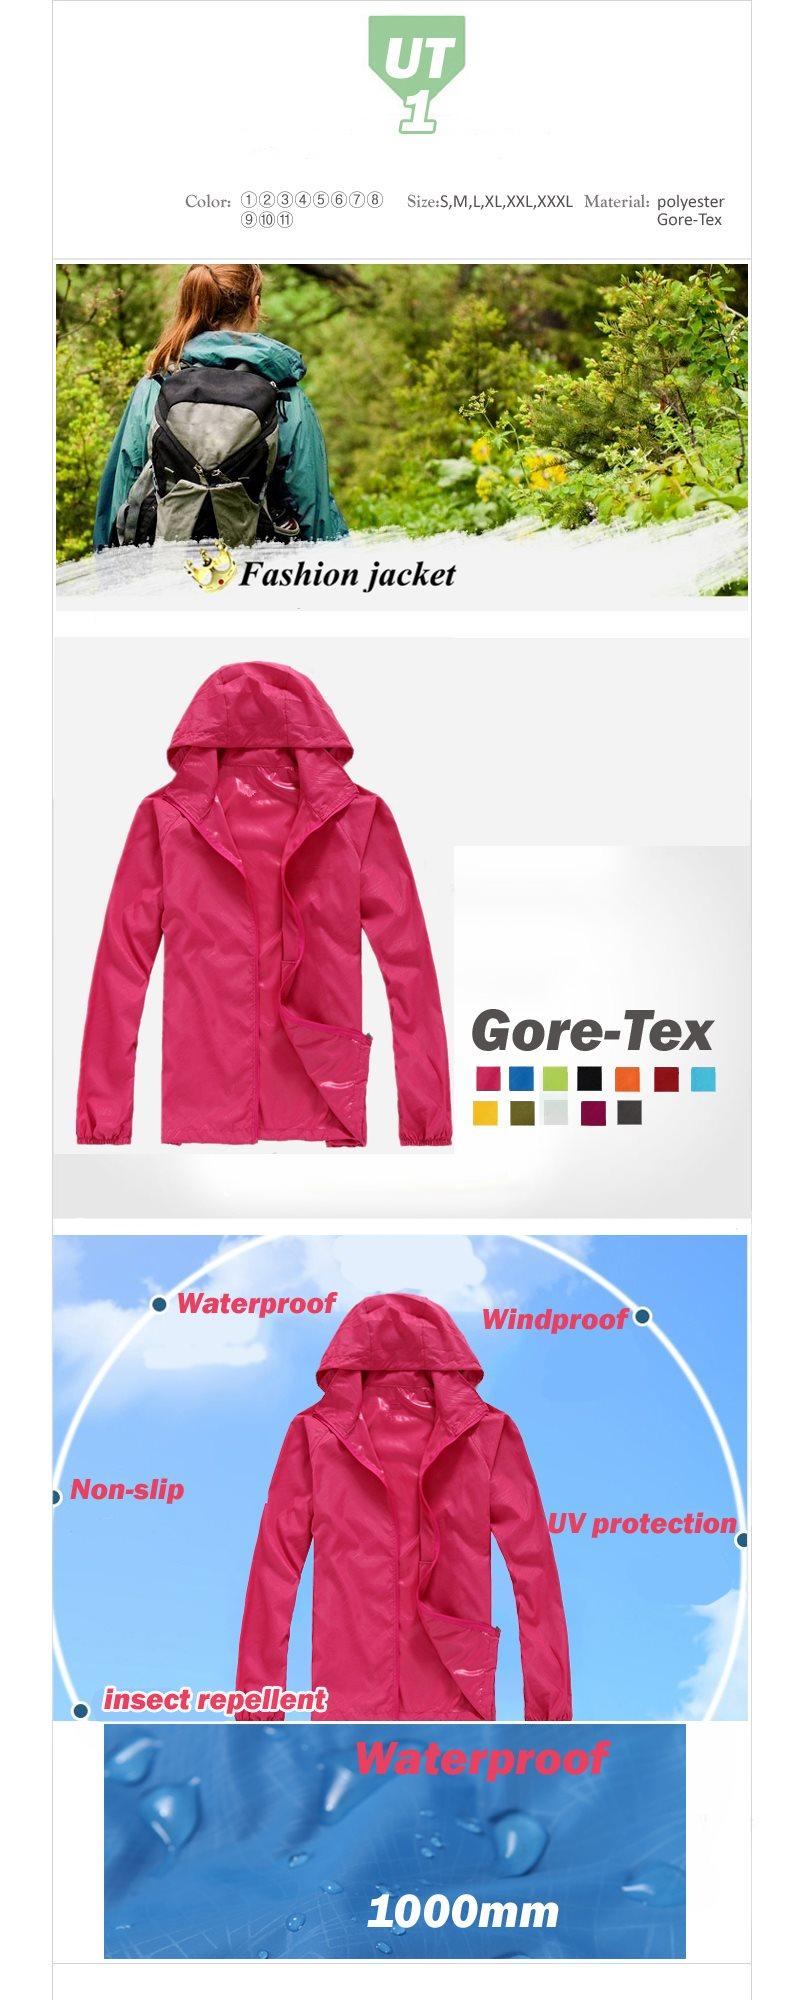 Buy Winter Collection Topman Jacket 8 Colors 2 Style Basic Jaket Sweater Unisex Pria Wanita High Quality Urgan Highlights